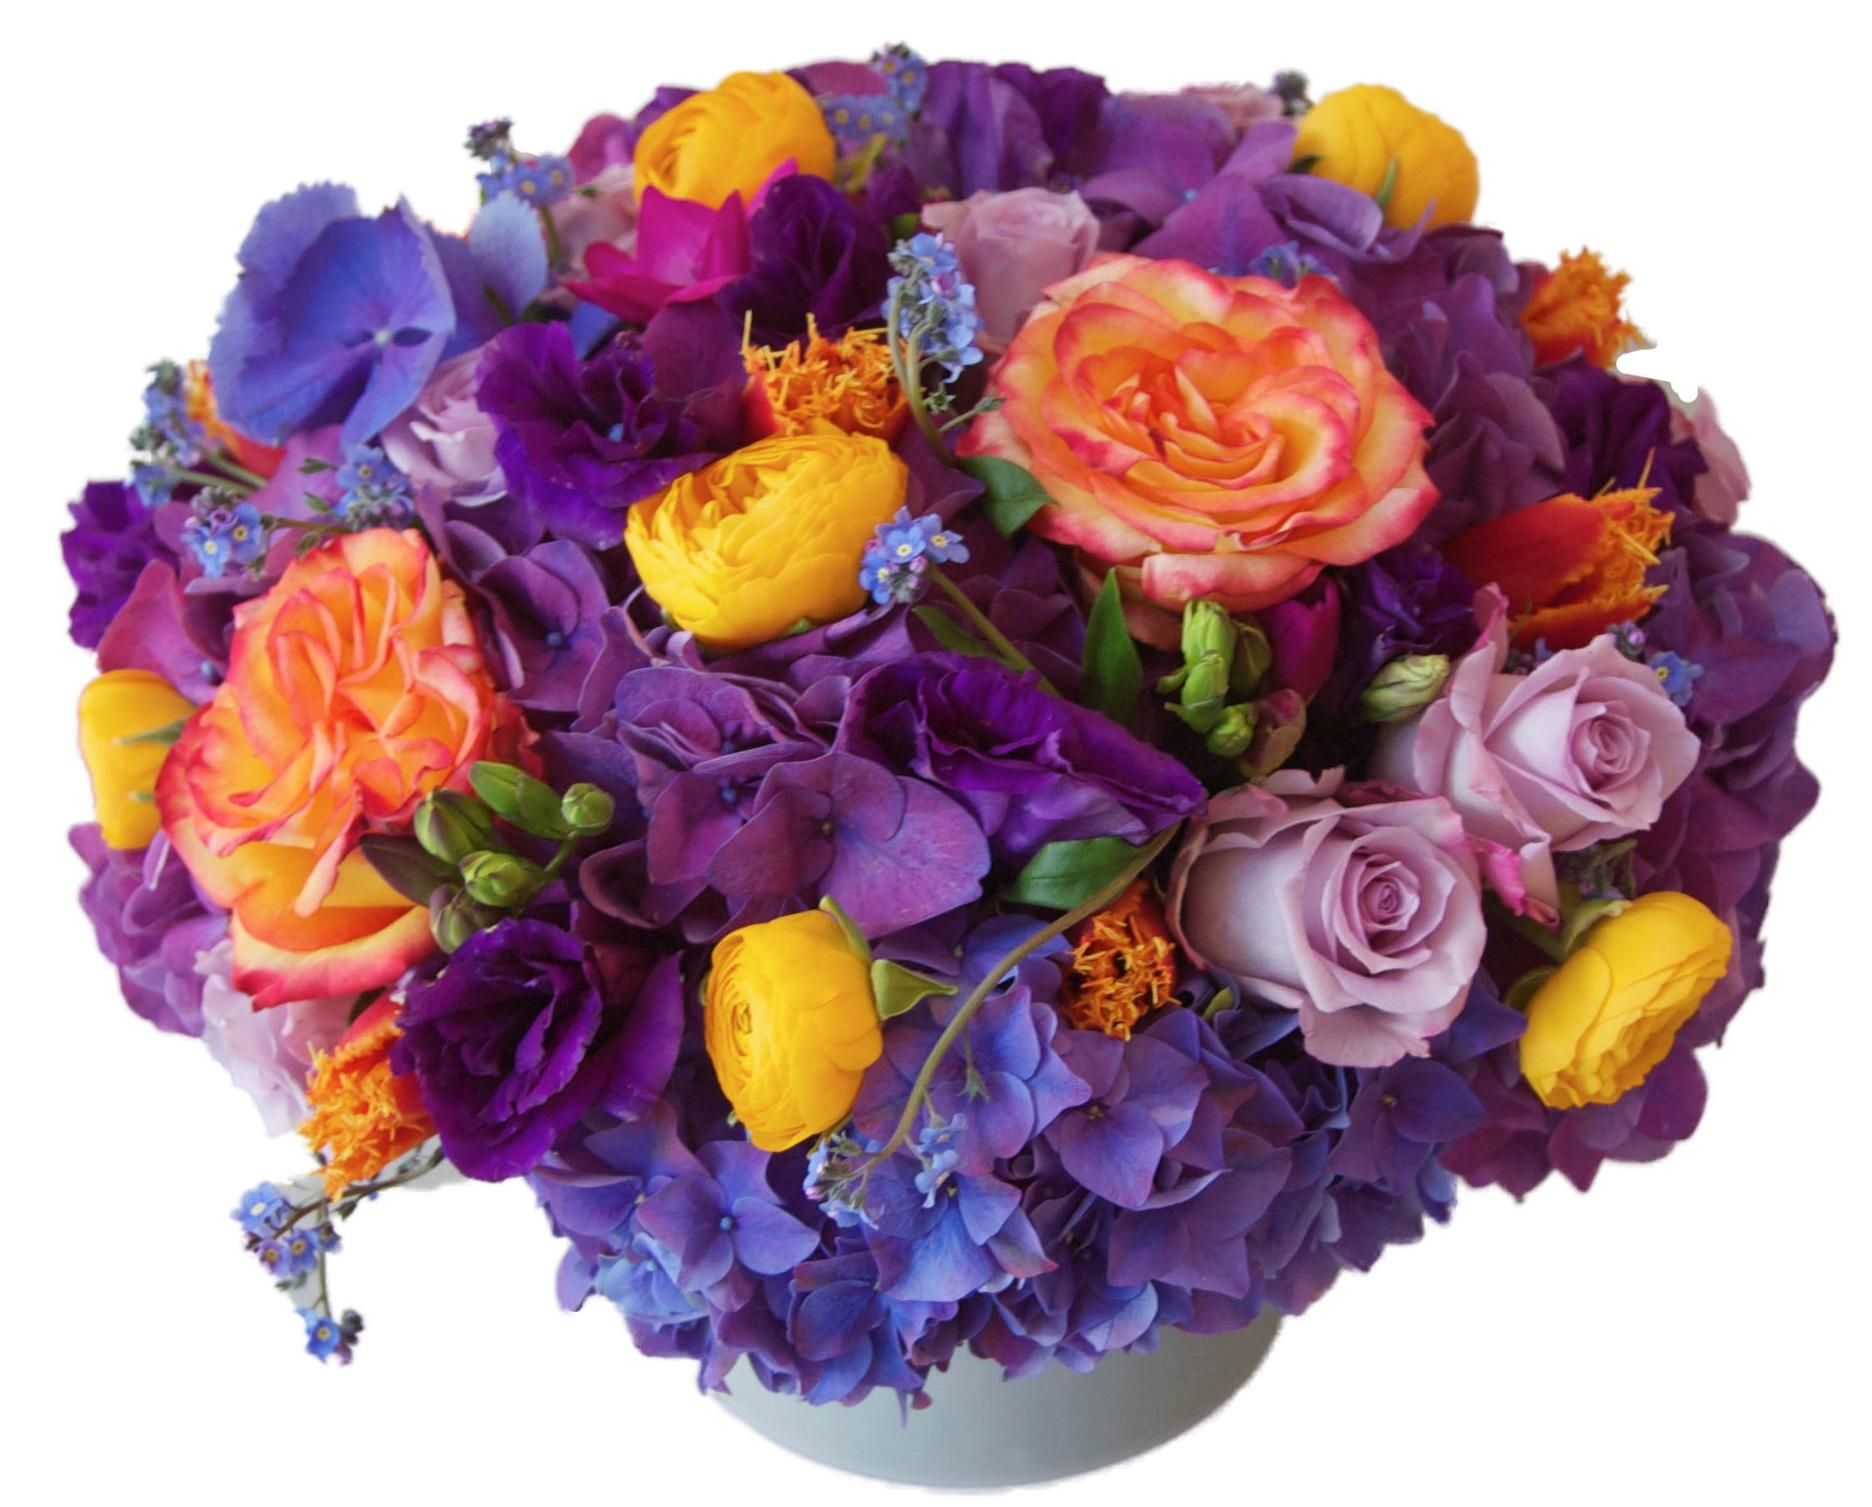 Purple Hydrangea with Oranges starts at $250